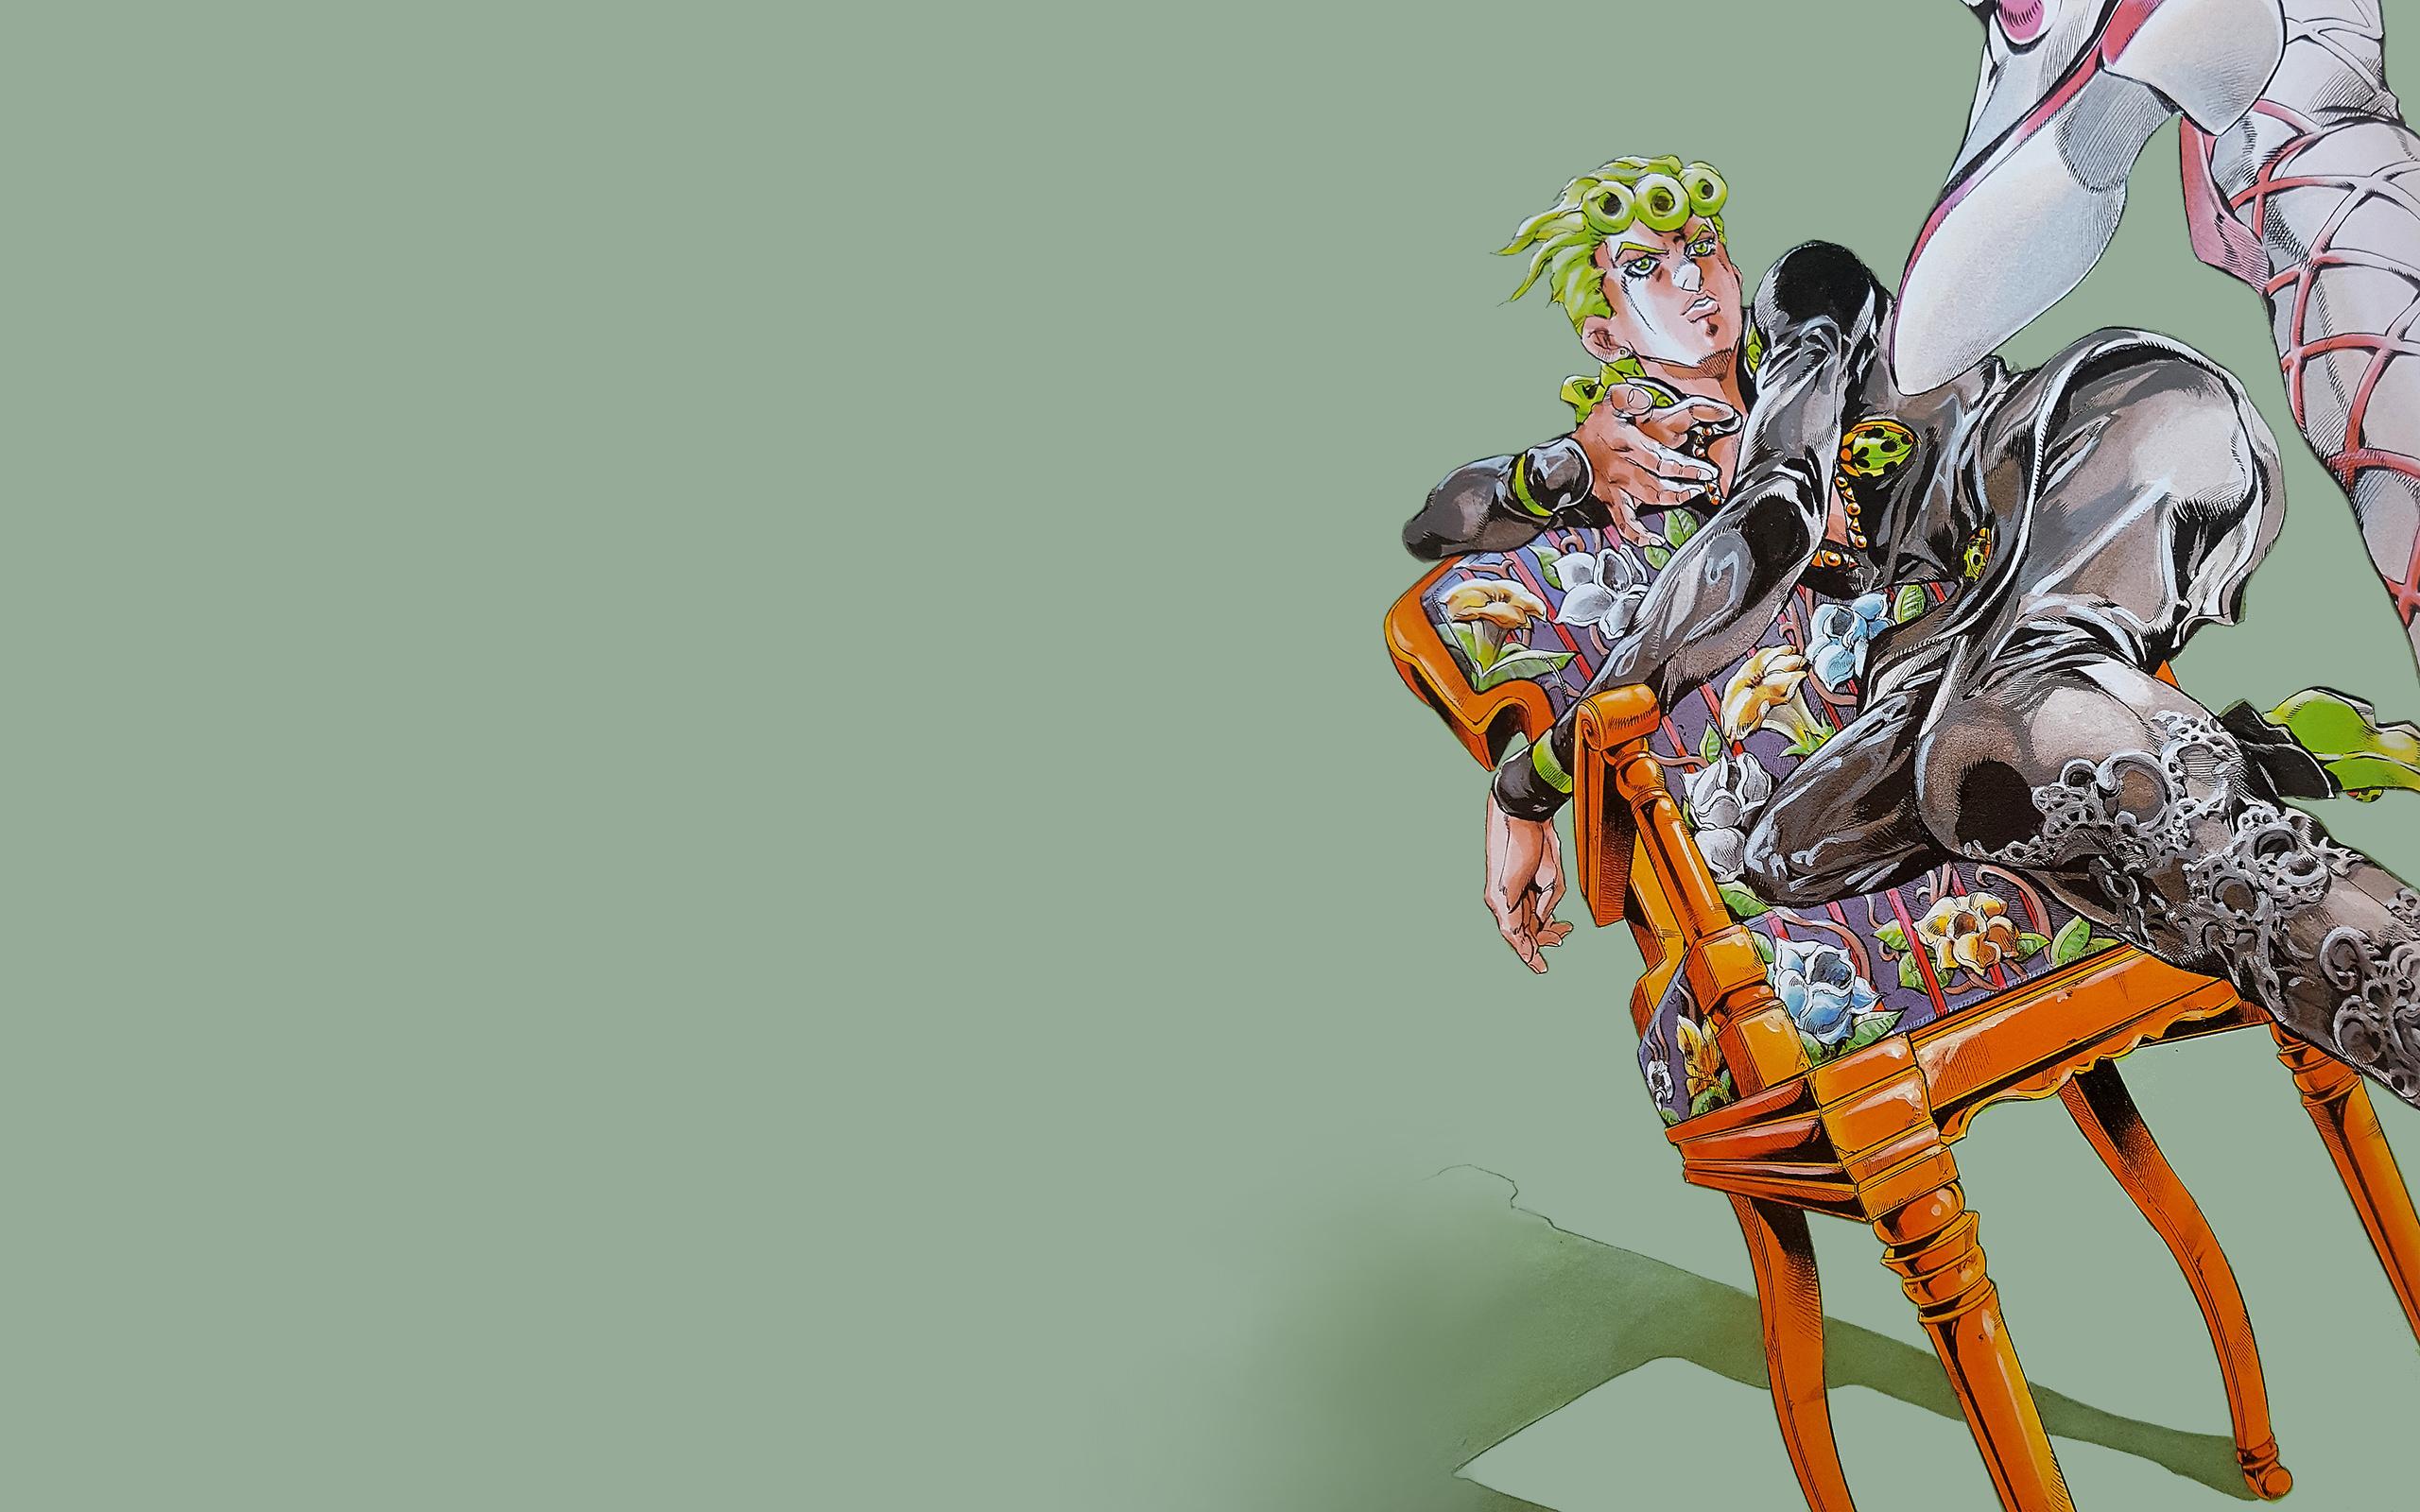 Wallpaper Jojo S Bizarre Adventure Jojolion Anime Manga